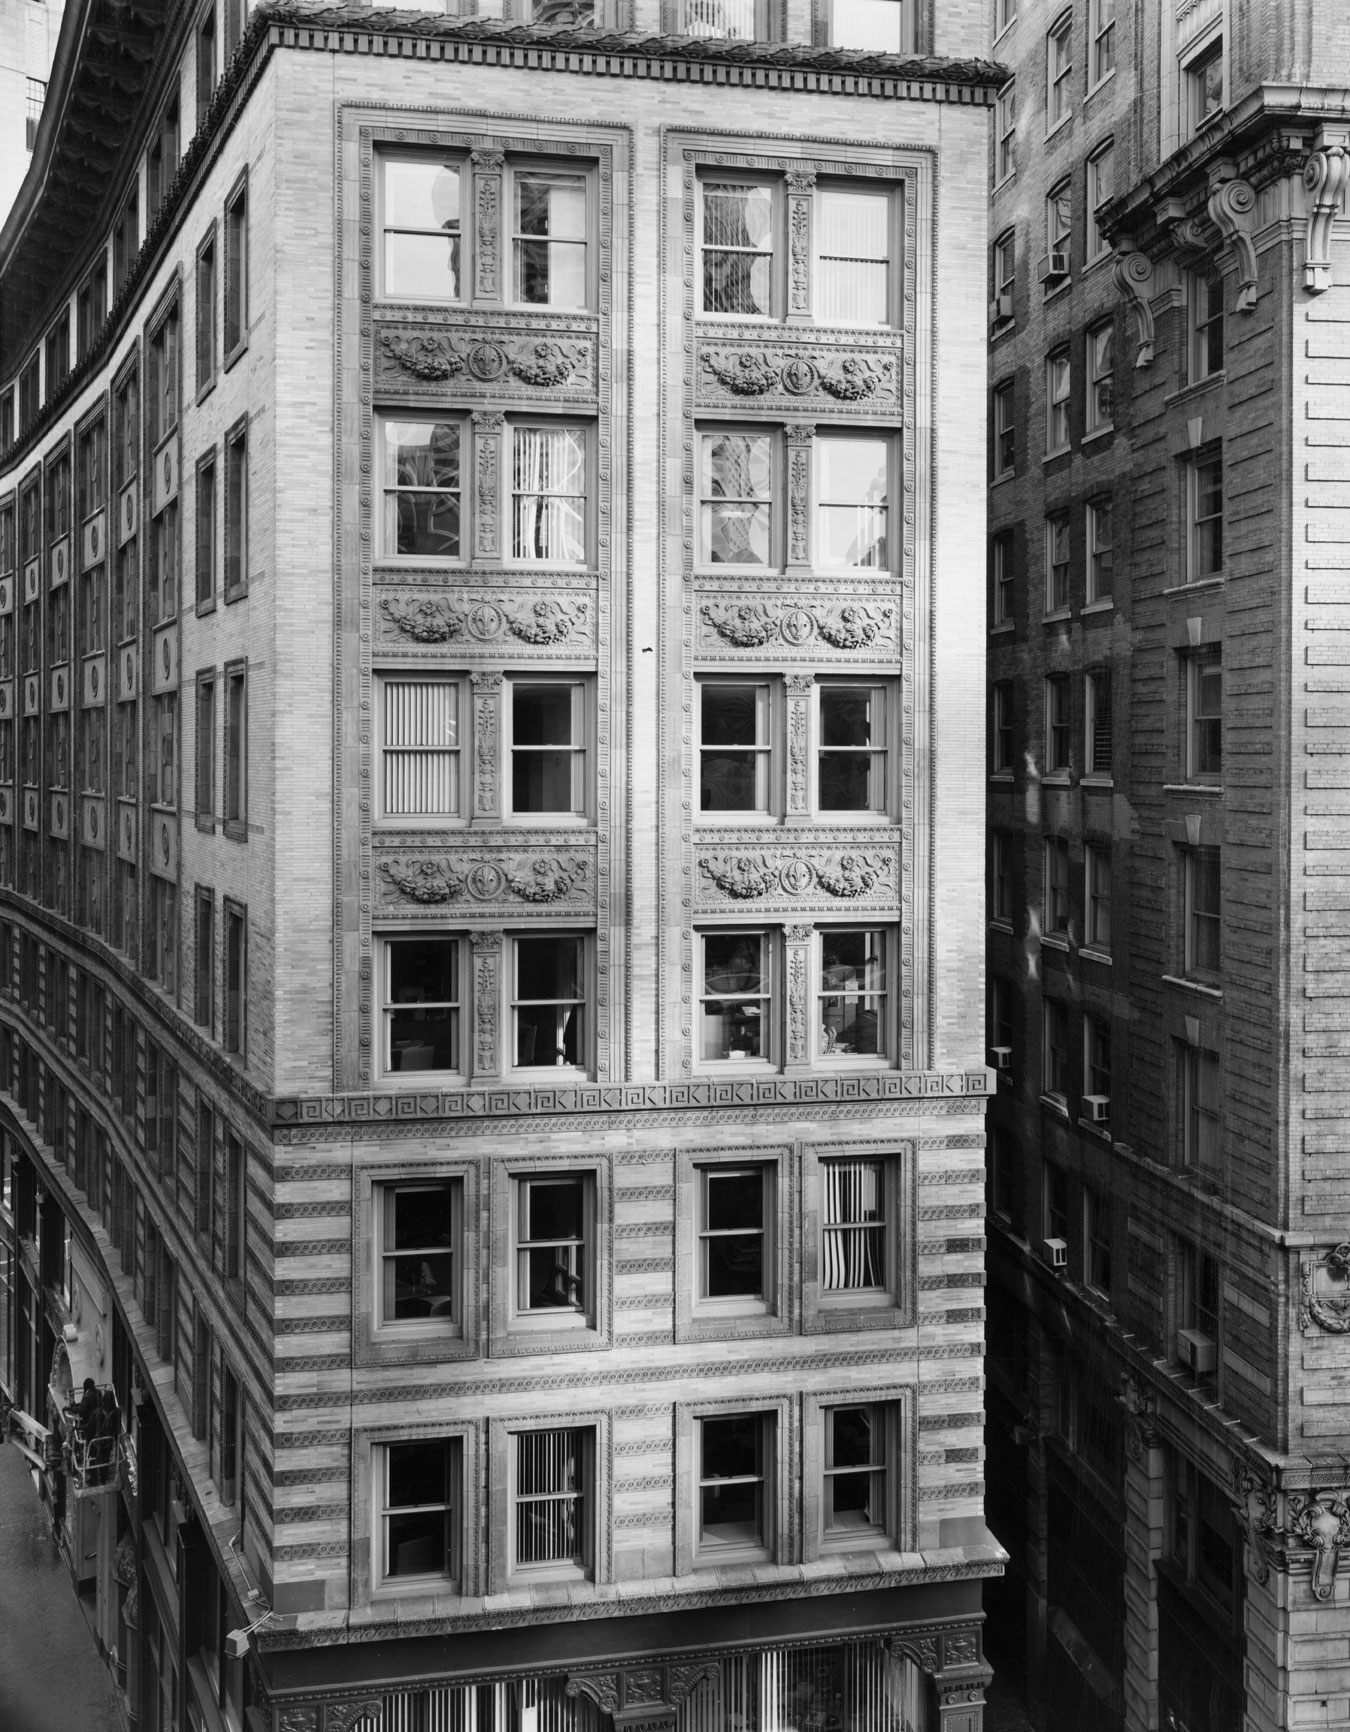 View of Washington Street, Boston [View East from Pi Alley, Boston]  2008, copy of 2009 Gelatin silver copy 34,6 x 27,3 cm. Photograph ©Nicholas Nixon. Courtesy of Fraenkel Gallery, San Francisco. Via Mapfre